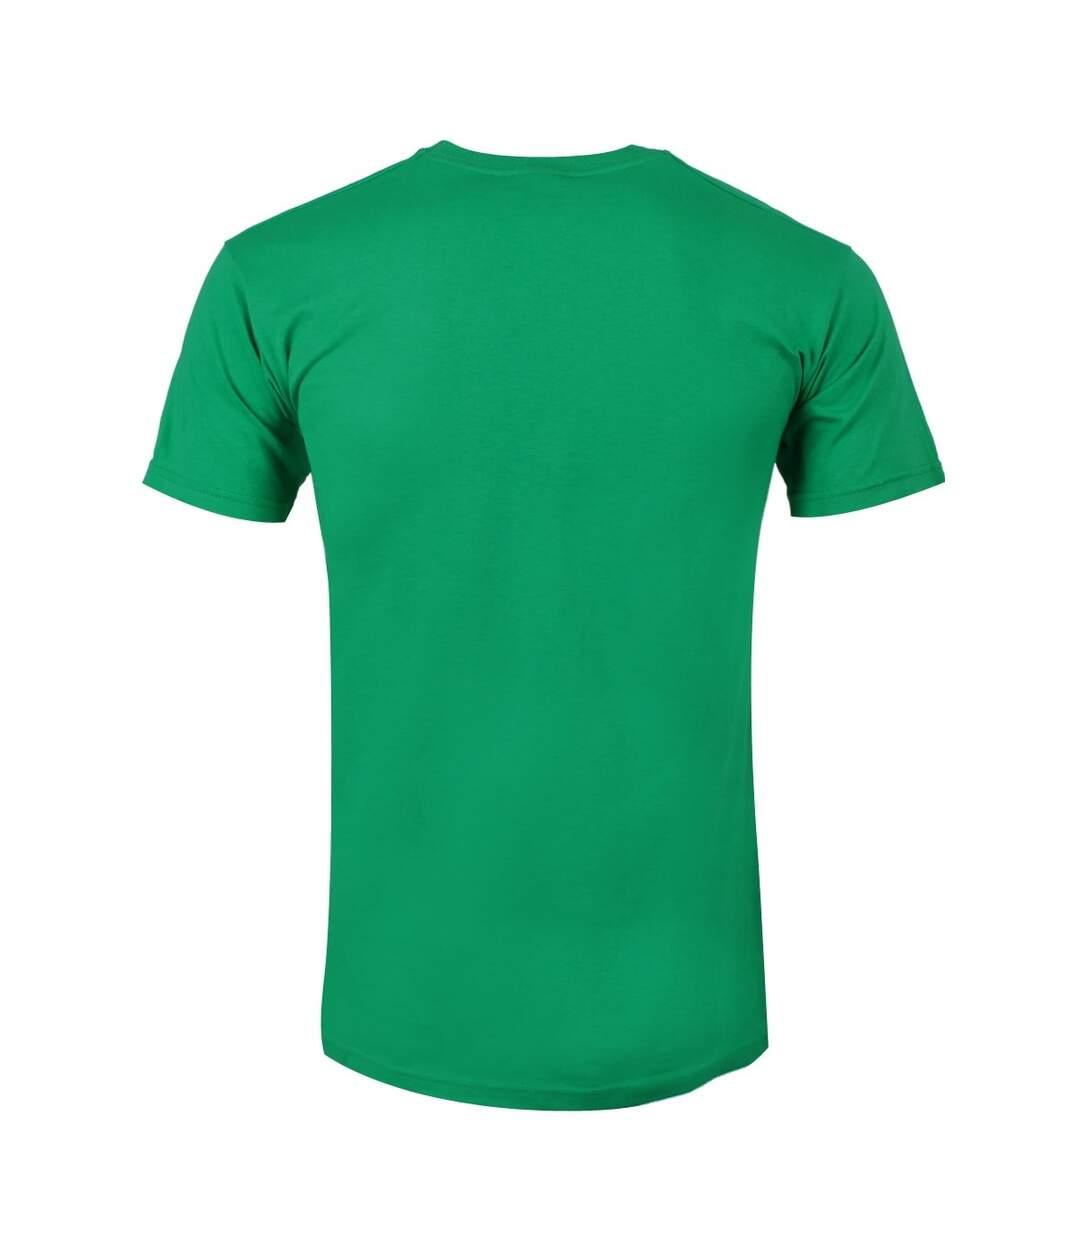 Grindstore Mens Boyles Email Blast T-Shirt (Green) - UTGR4198